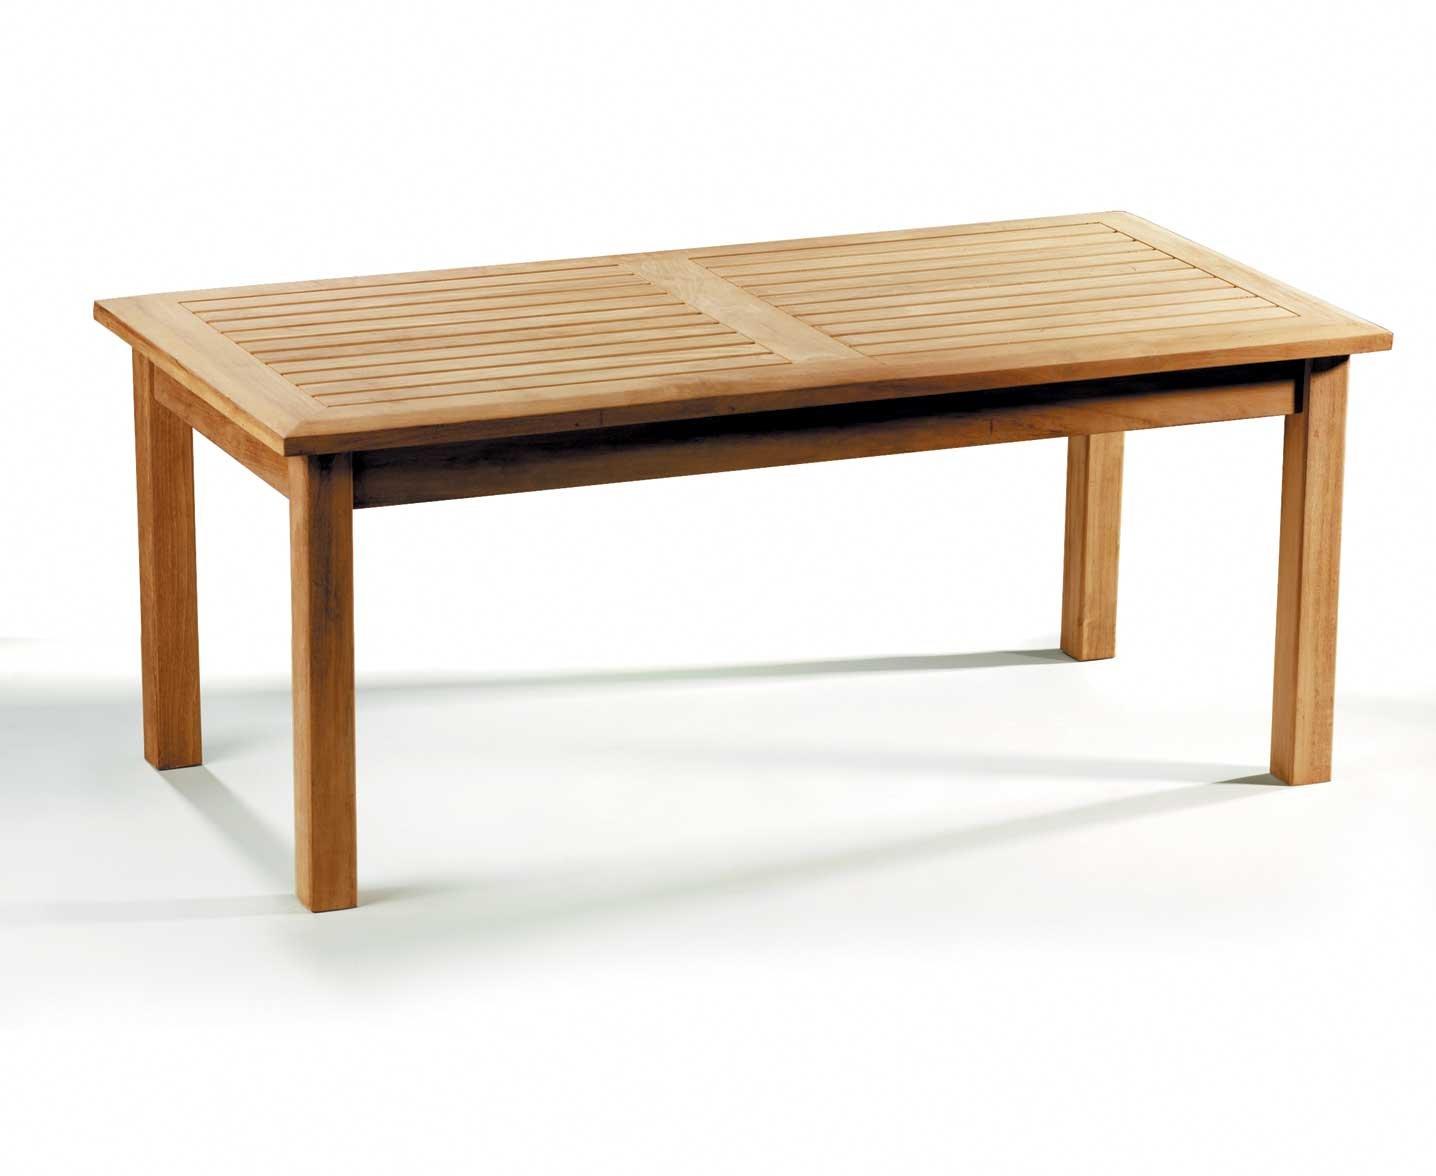 Jati Teak Rectangular Garden Coffee Table 120 x 60cm Brand, Quality & Value